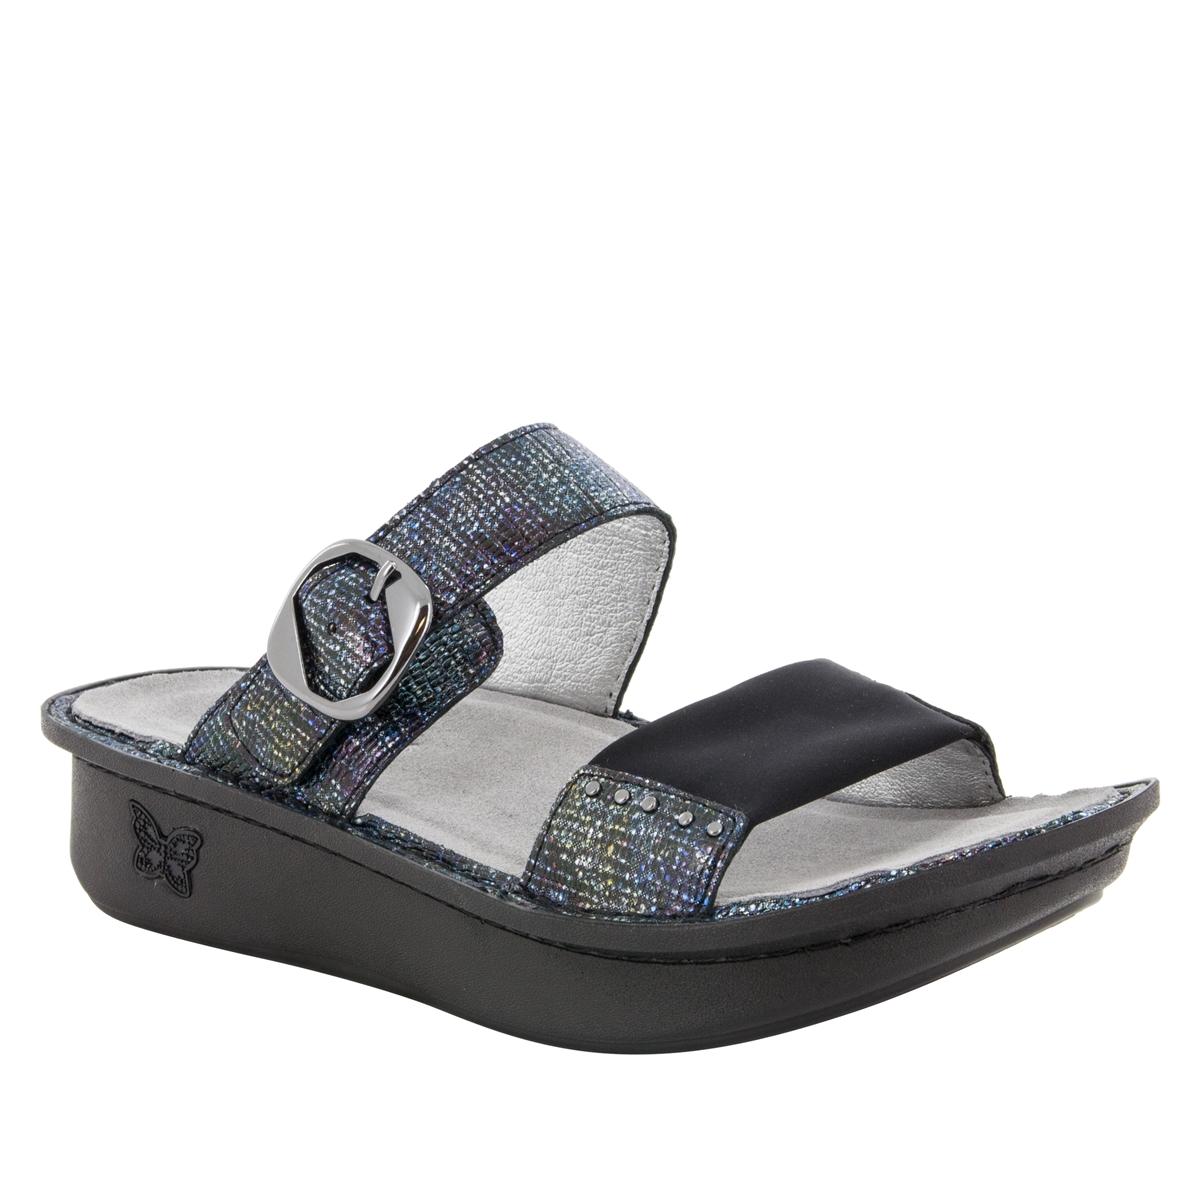 e441f4df971 Keara Glimmer Glam Sandals - Alegria Shoes